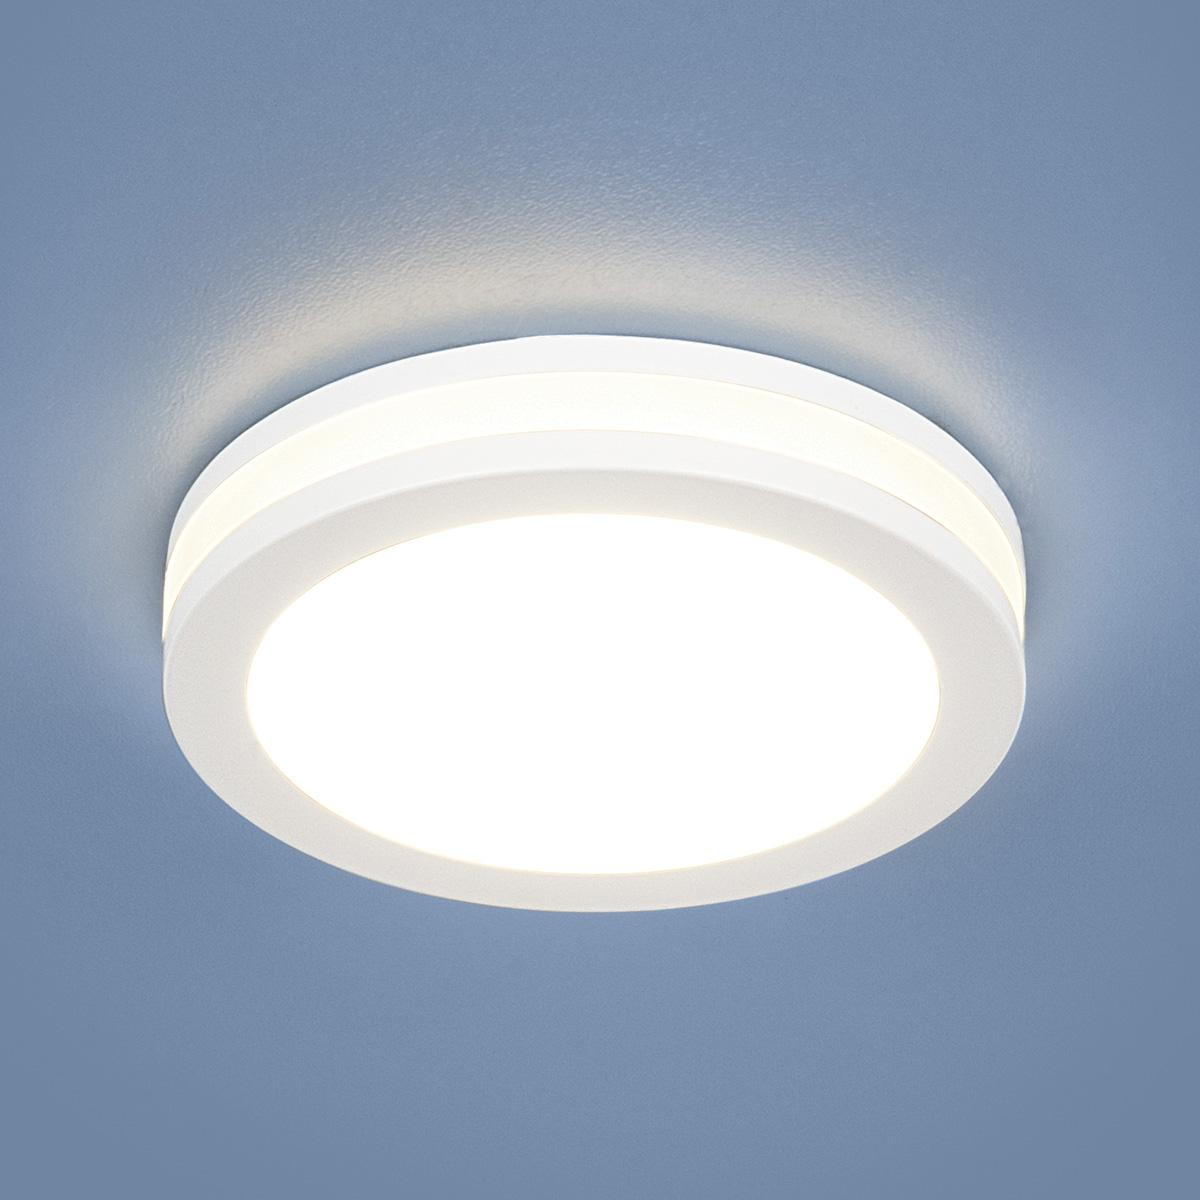 Точечный светильник Elektrostandard DSKR80 5W 4200K WH белый